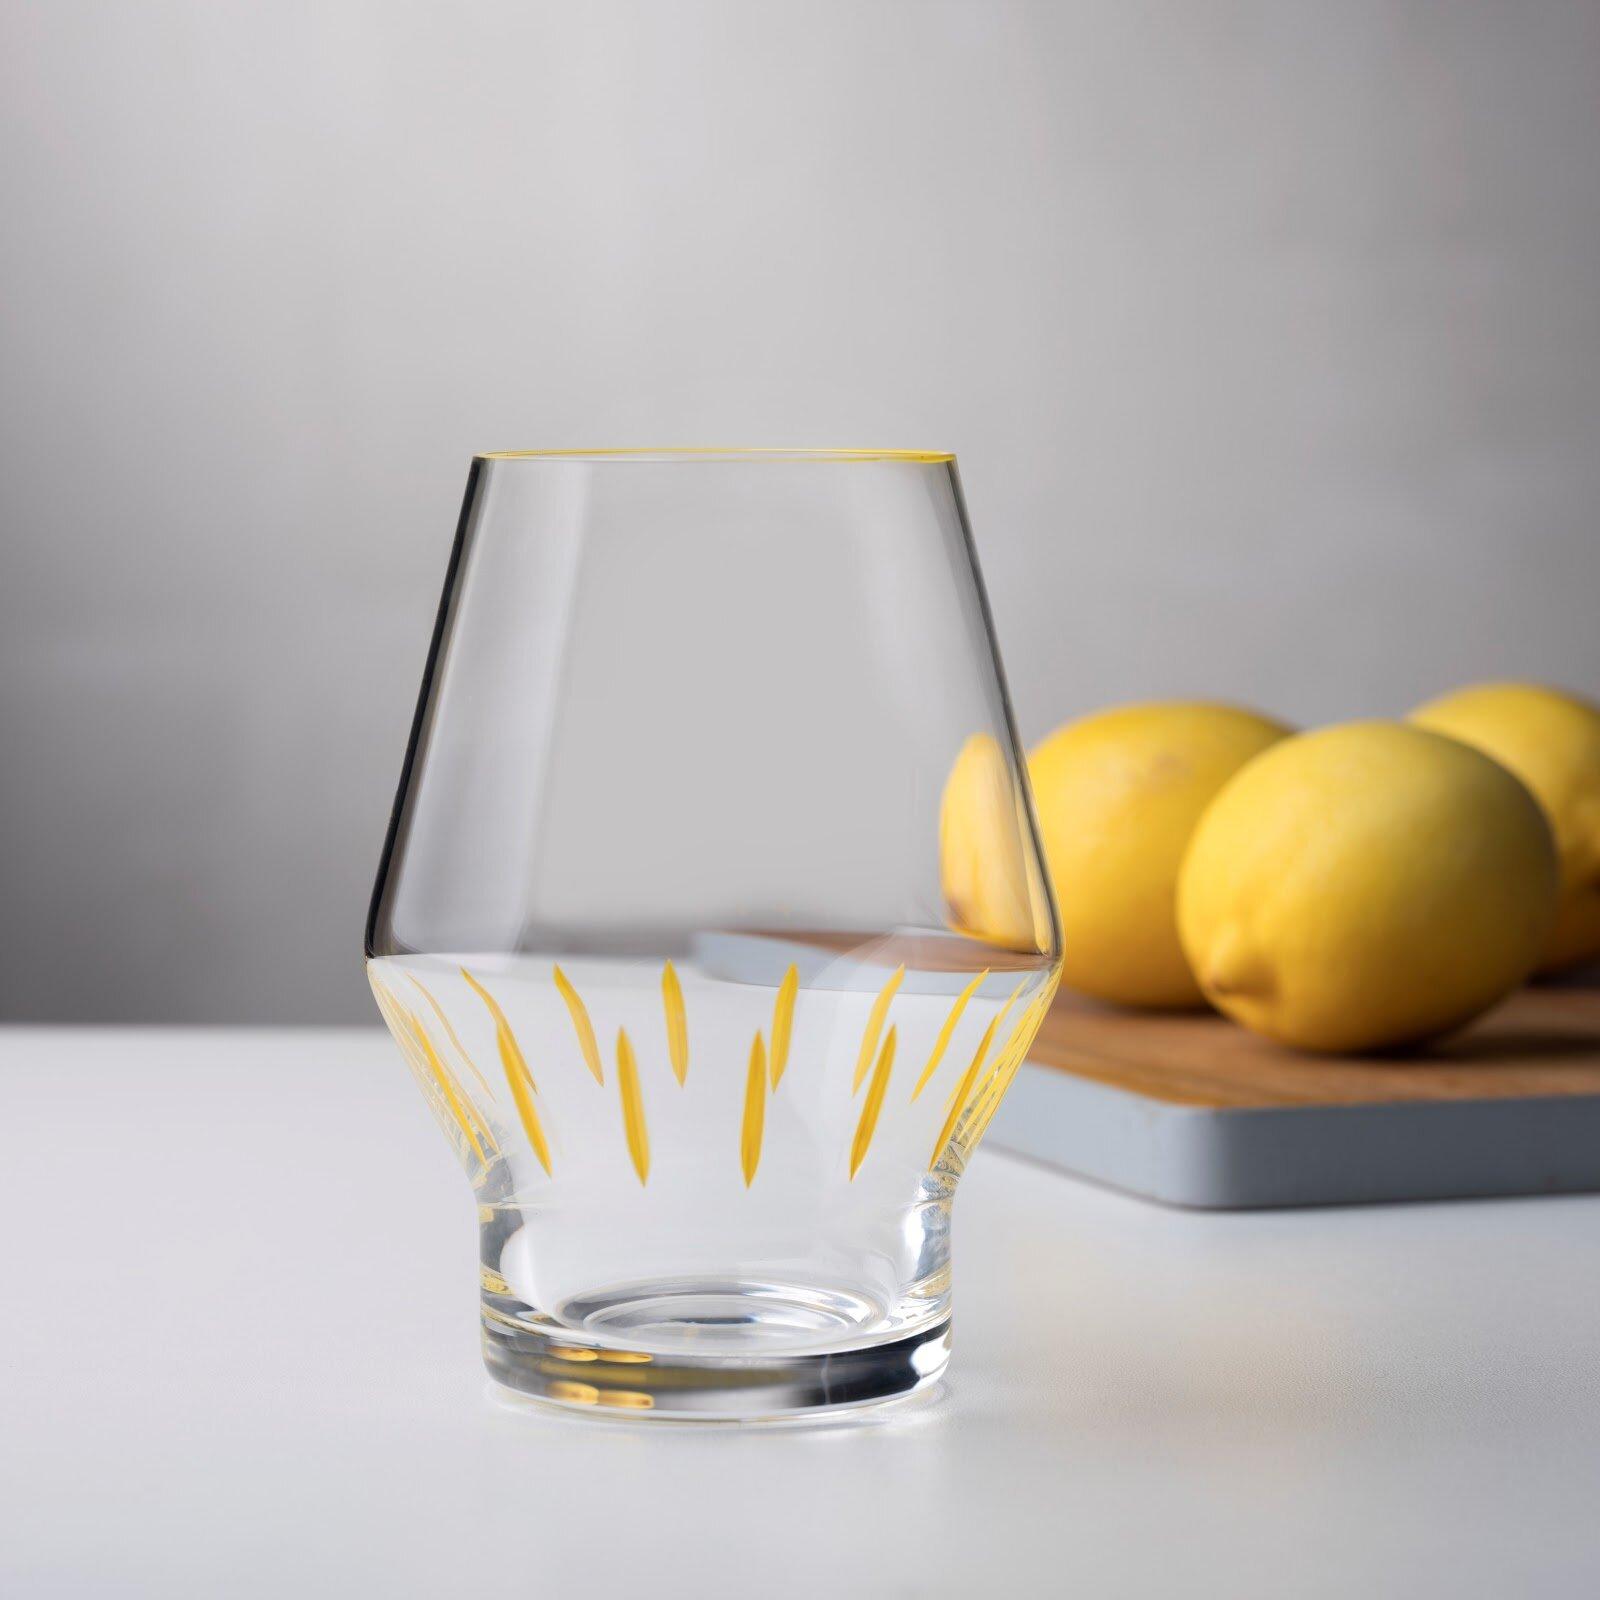 Nude Iris Apfel 12 Oz Crystal Drinking Glass Wayfair